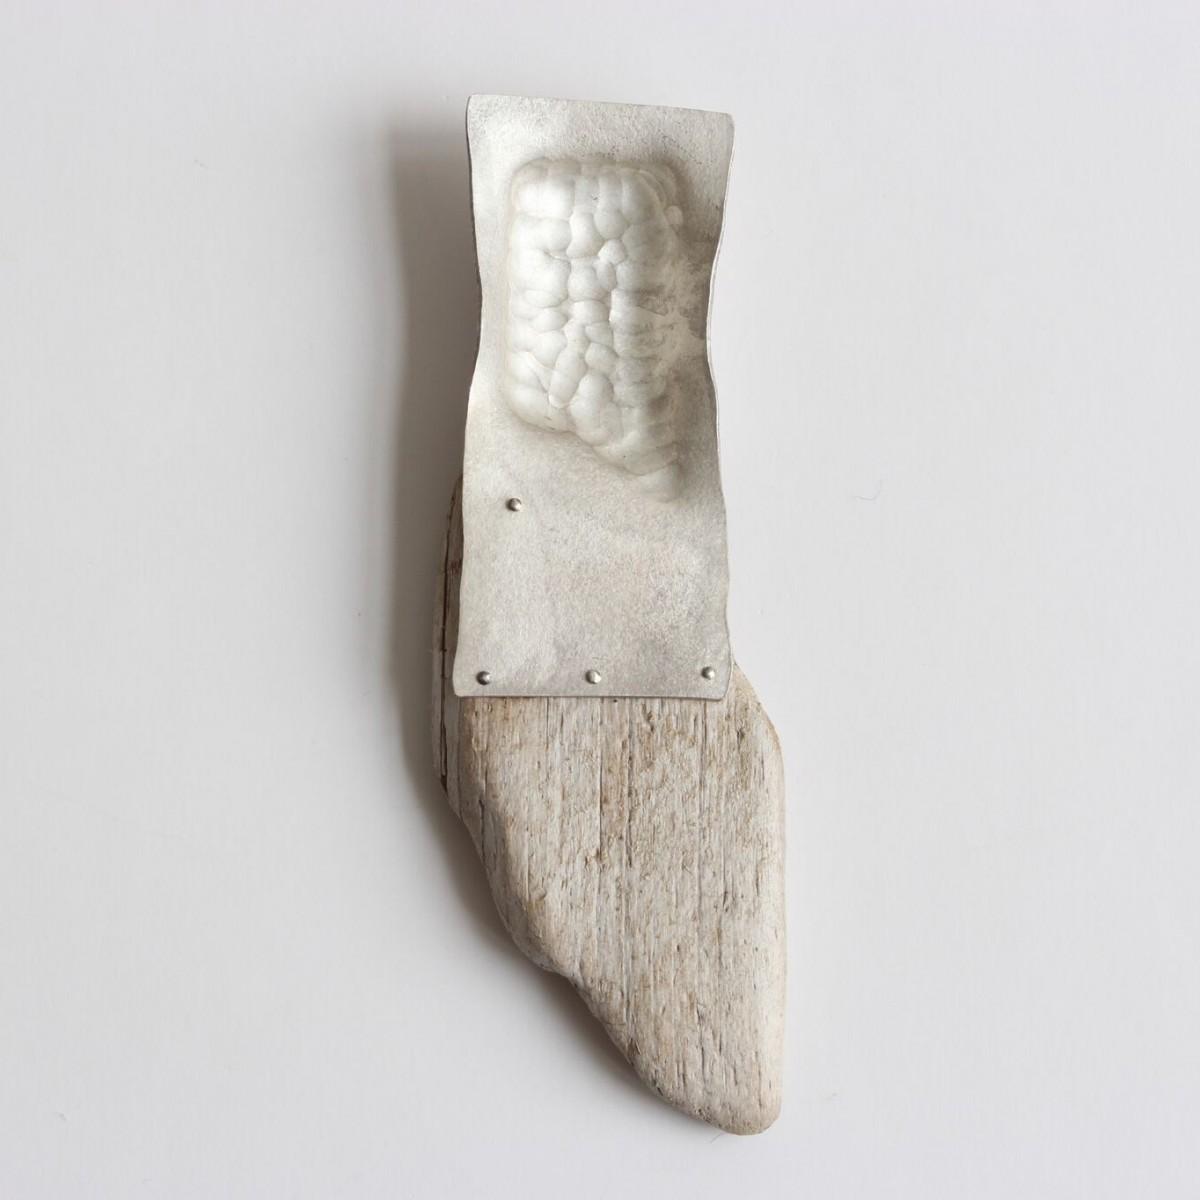 Little driftwood spoon